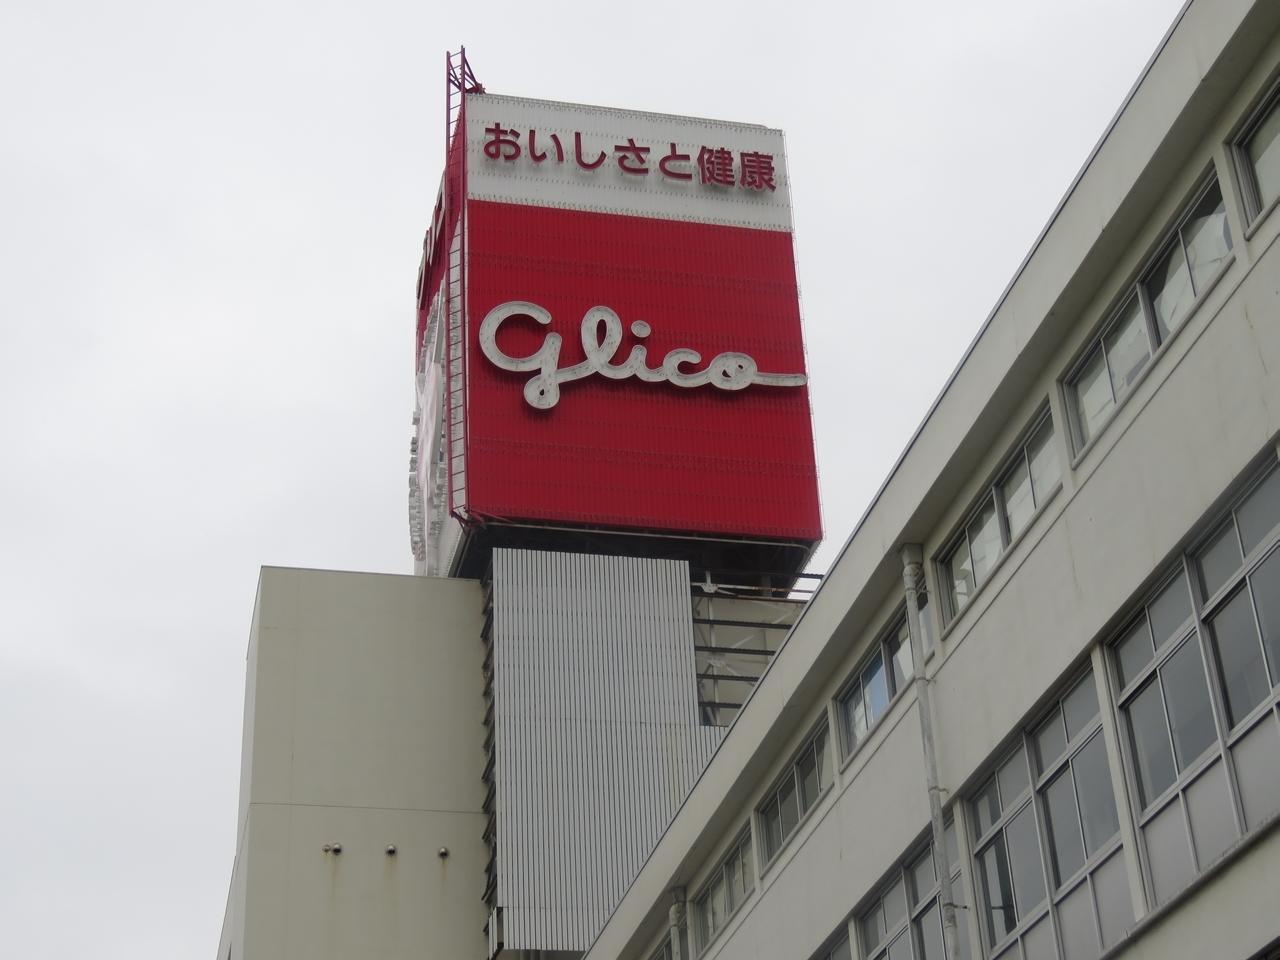 s-江崎記念館